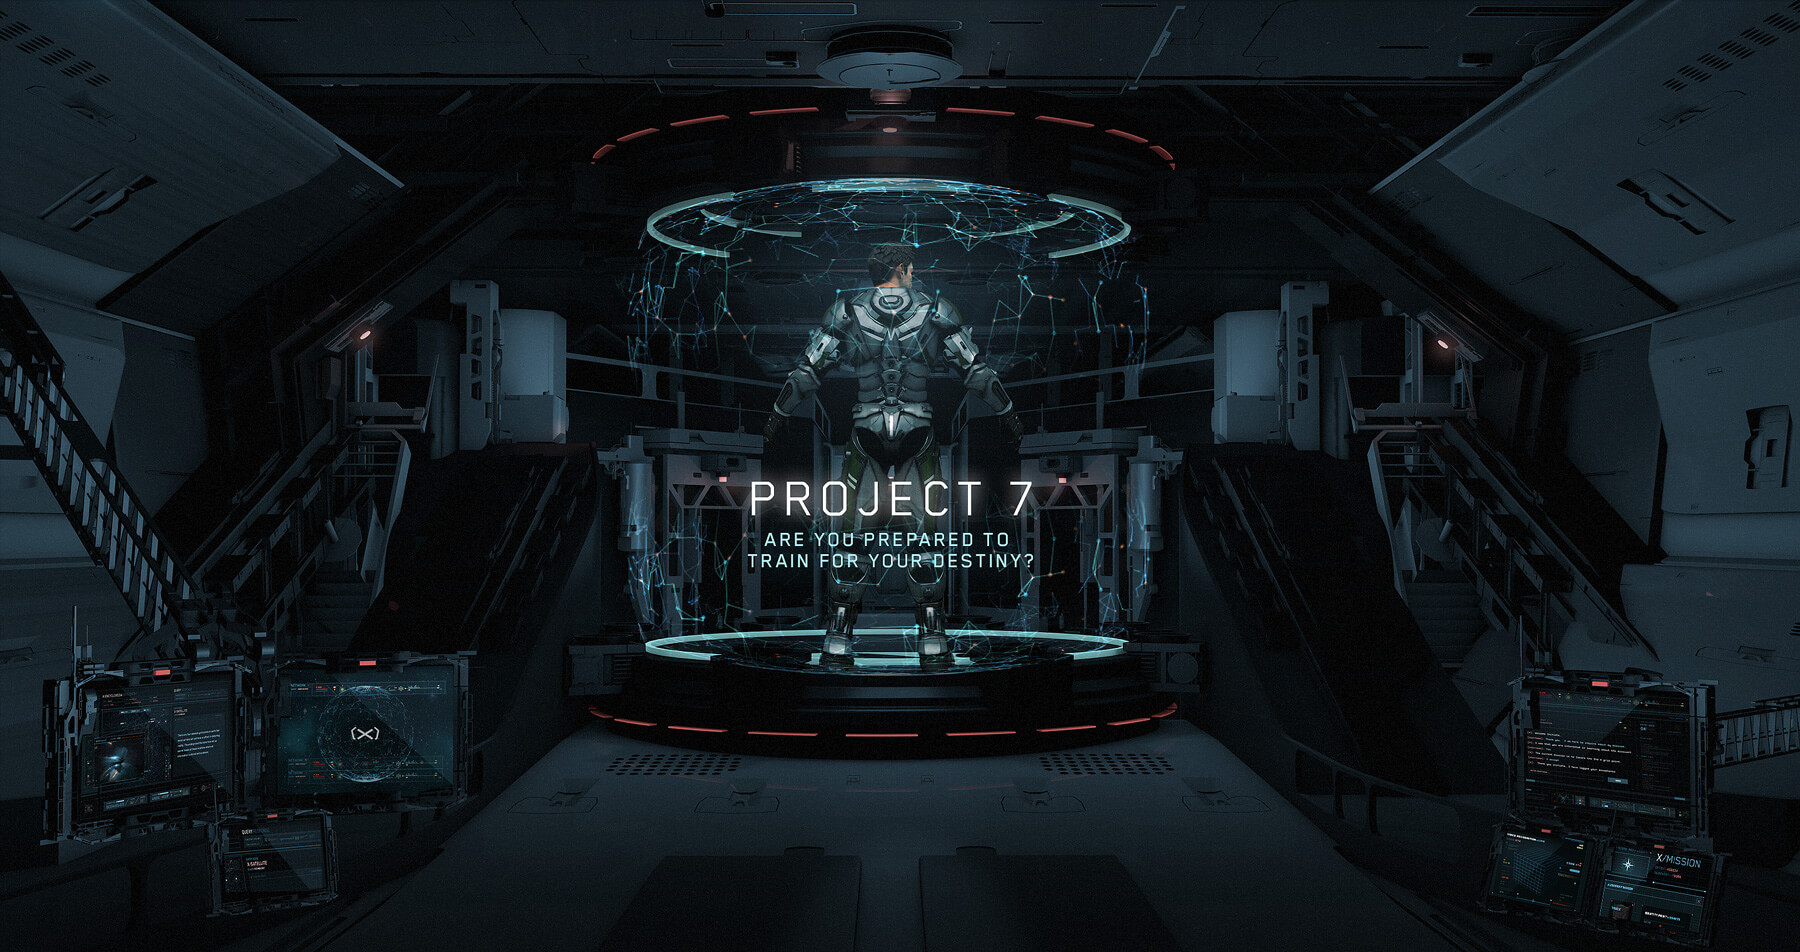 Eric Jordan - Project 7 / X Path